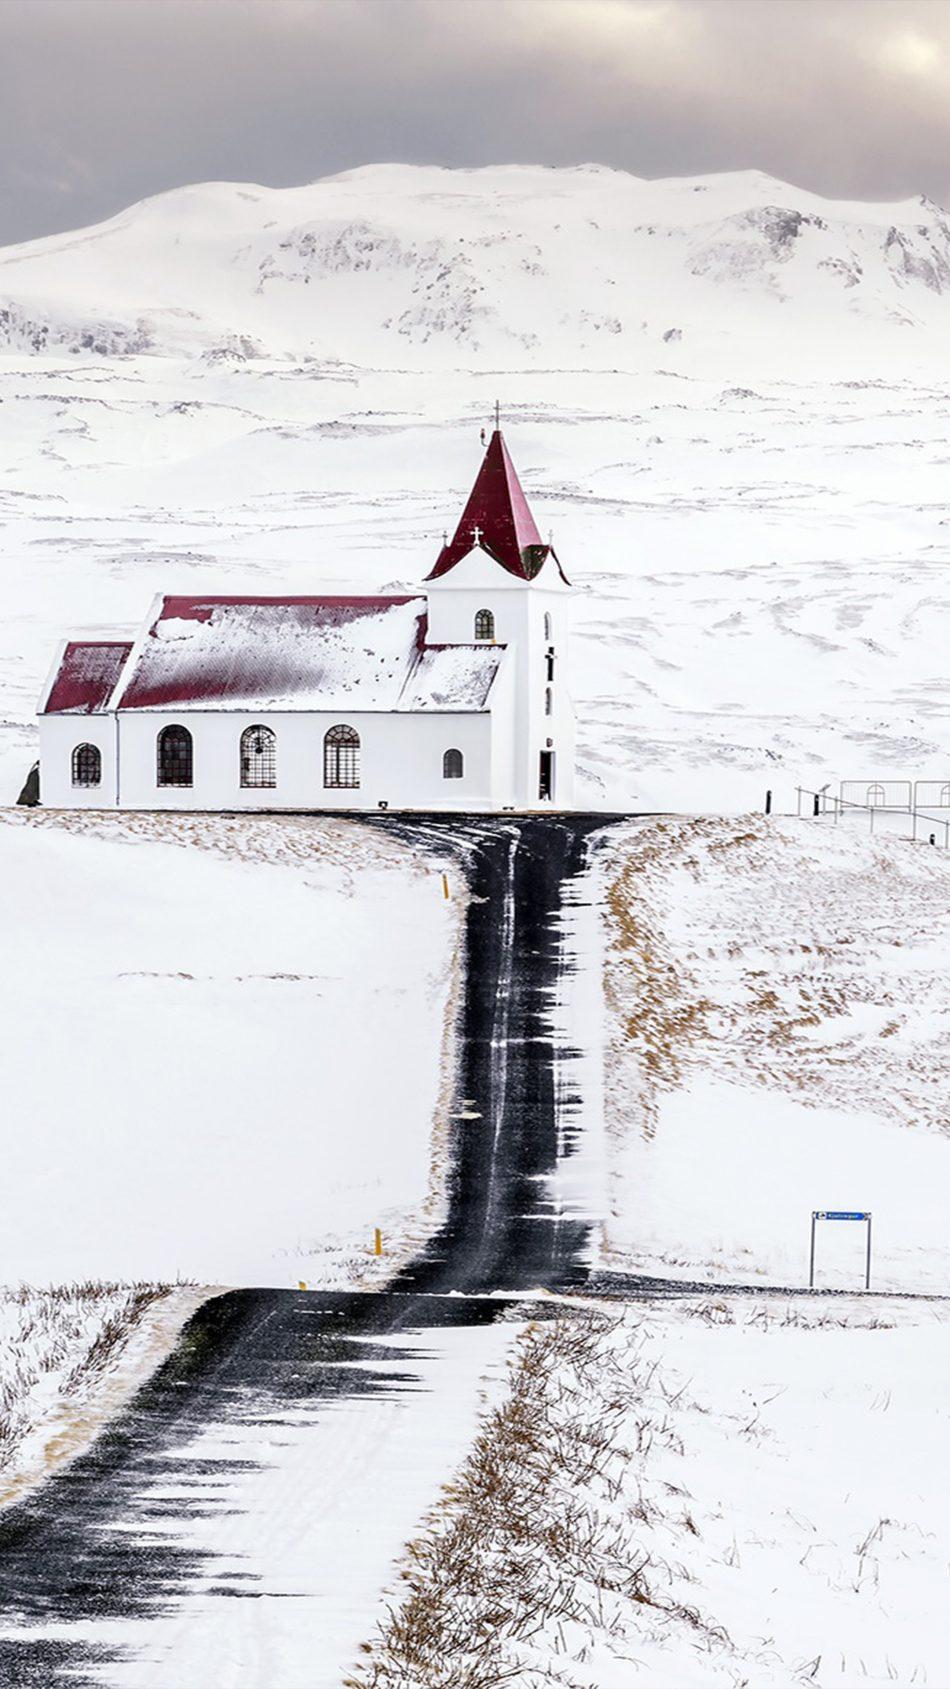 Church Snow Landscape 4k Ultra Hd Mobile Wallpaper - 4k Ultra Hd Snow Wallpaper 4k - HD Wallpaper